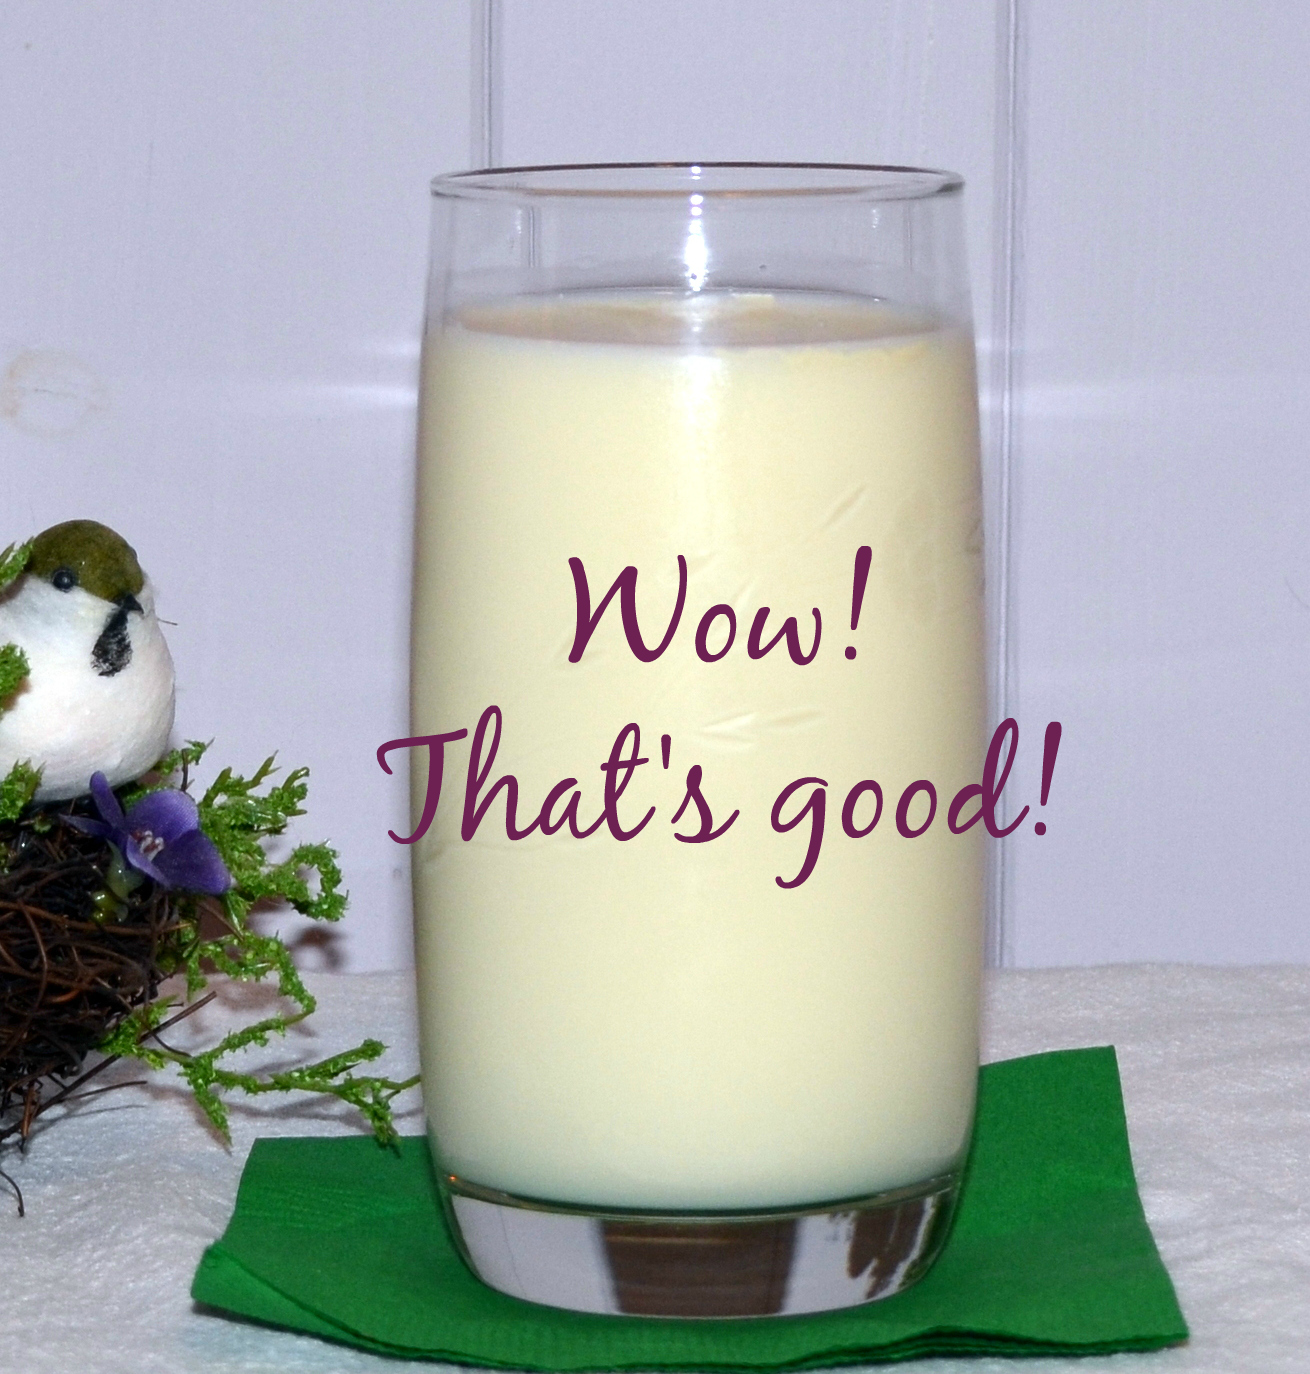 Cinnamon's milk is everybody's favorite on my farm.